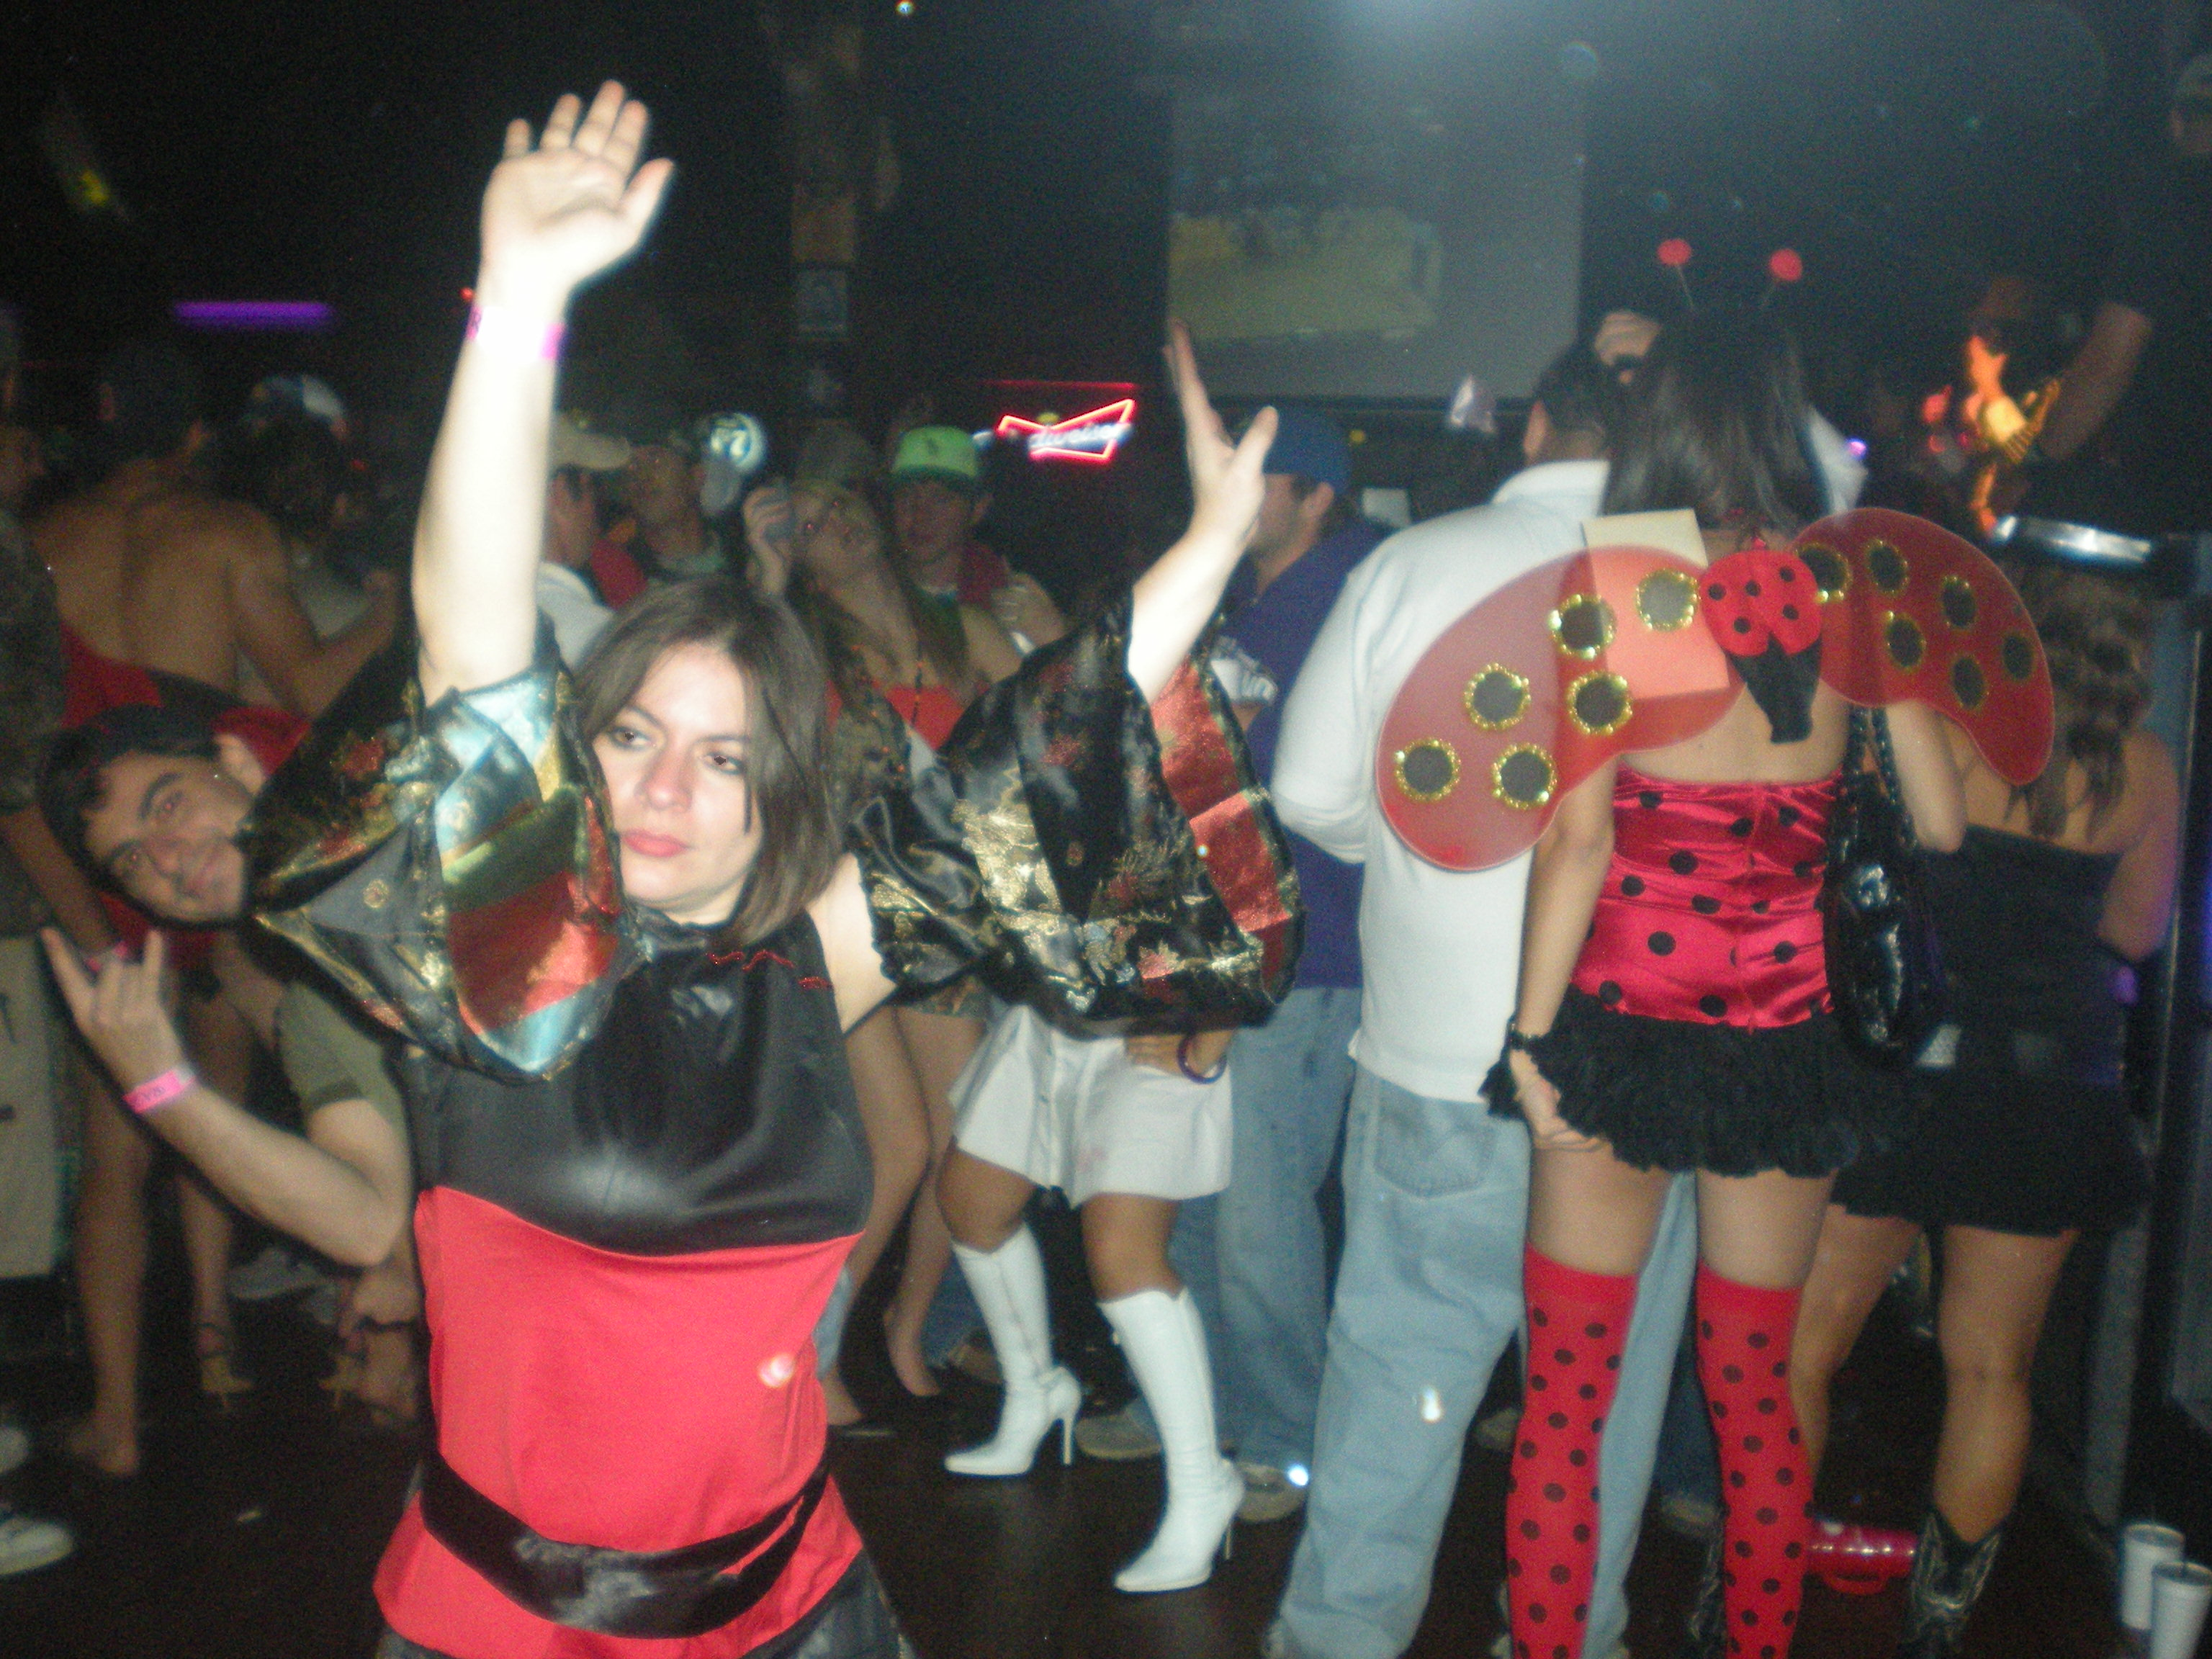 swinger-halloween-party-photo-teen-girls-lesbians